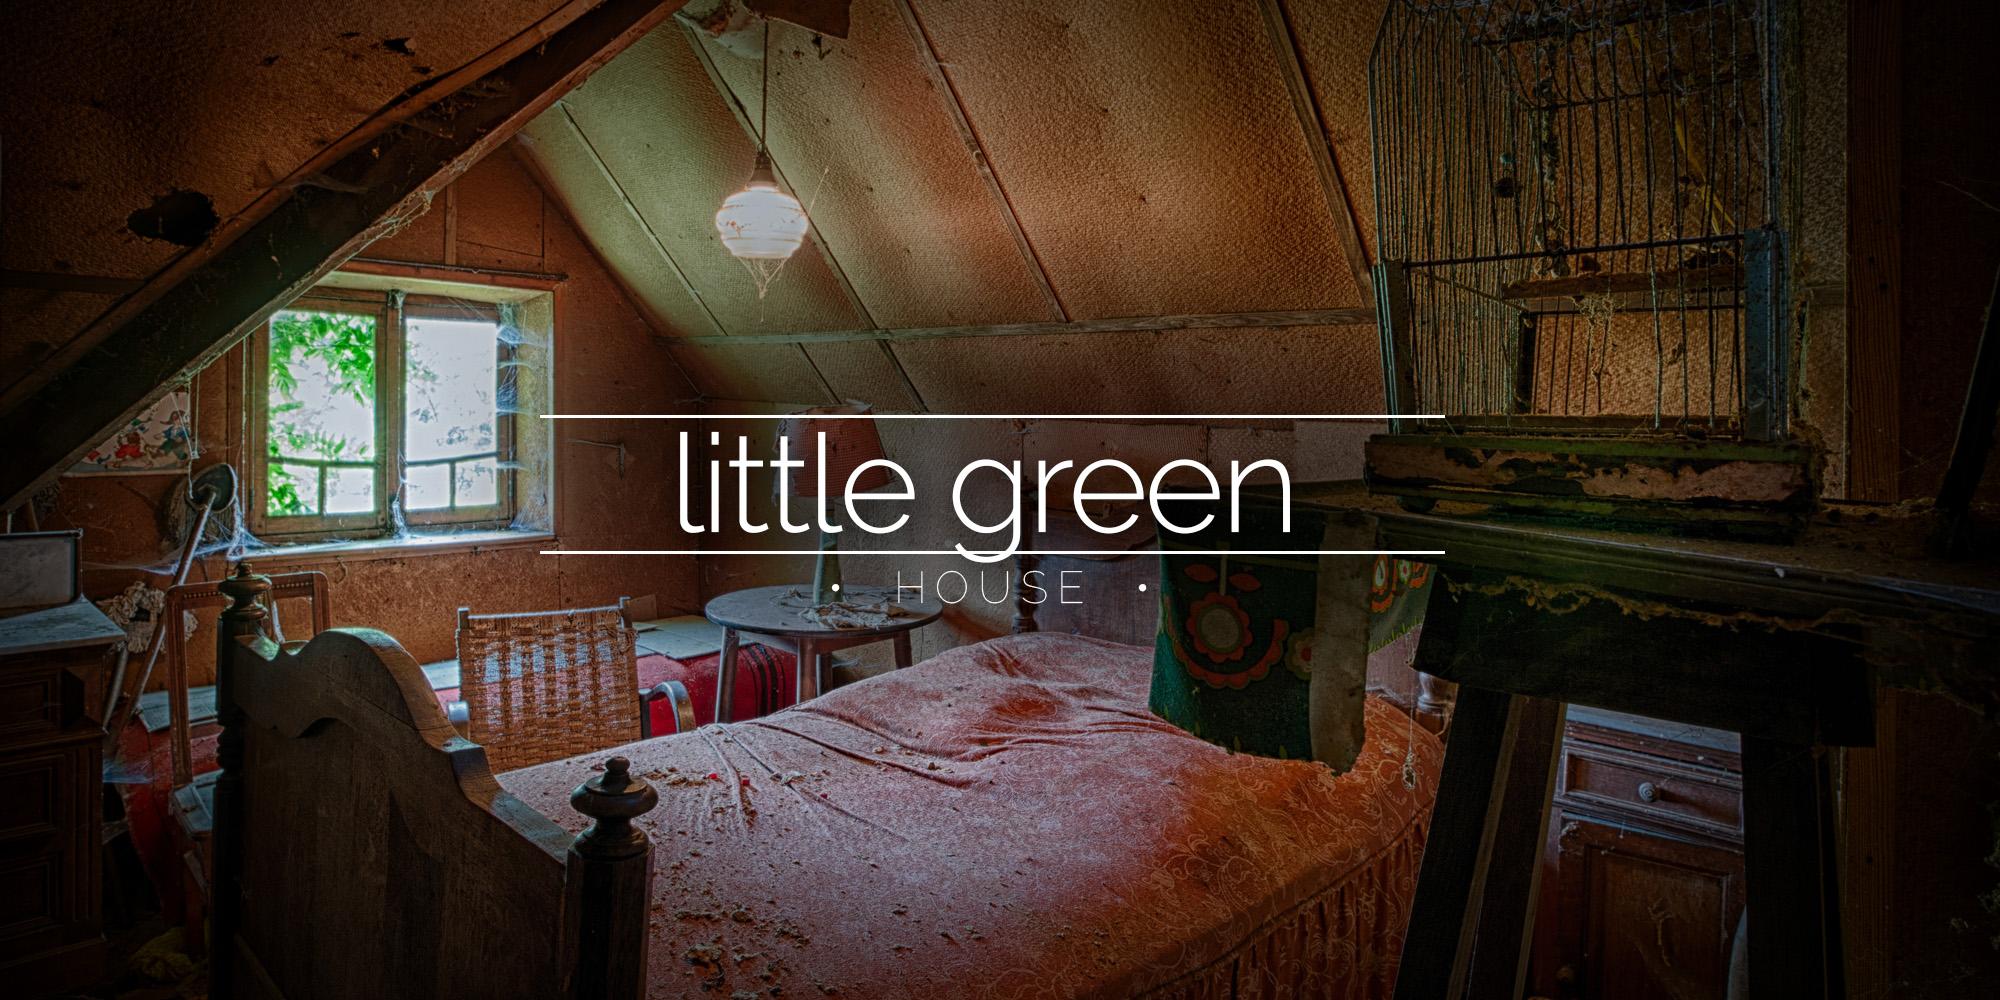 Industrial Dining Room Table Little Green House Belgium 187 Urbex Behind Closed Doors